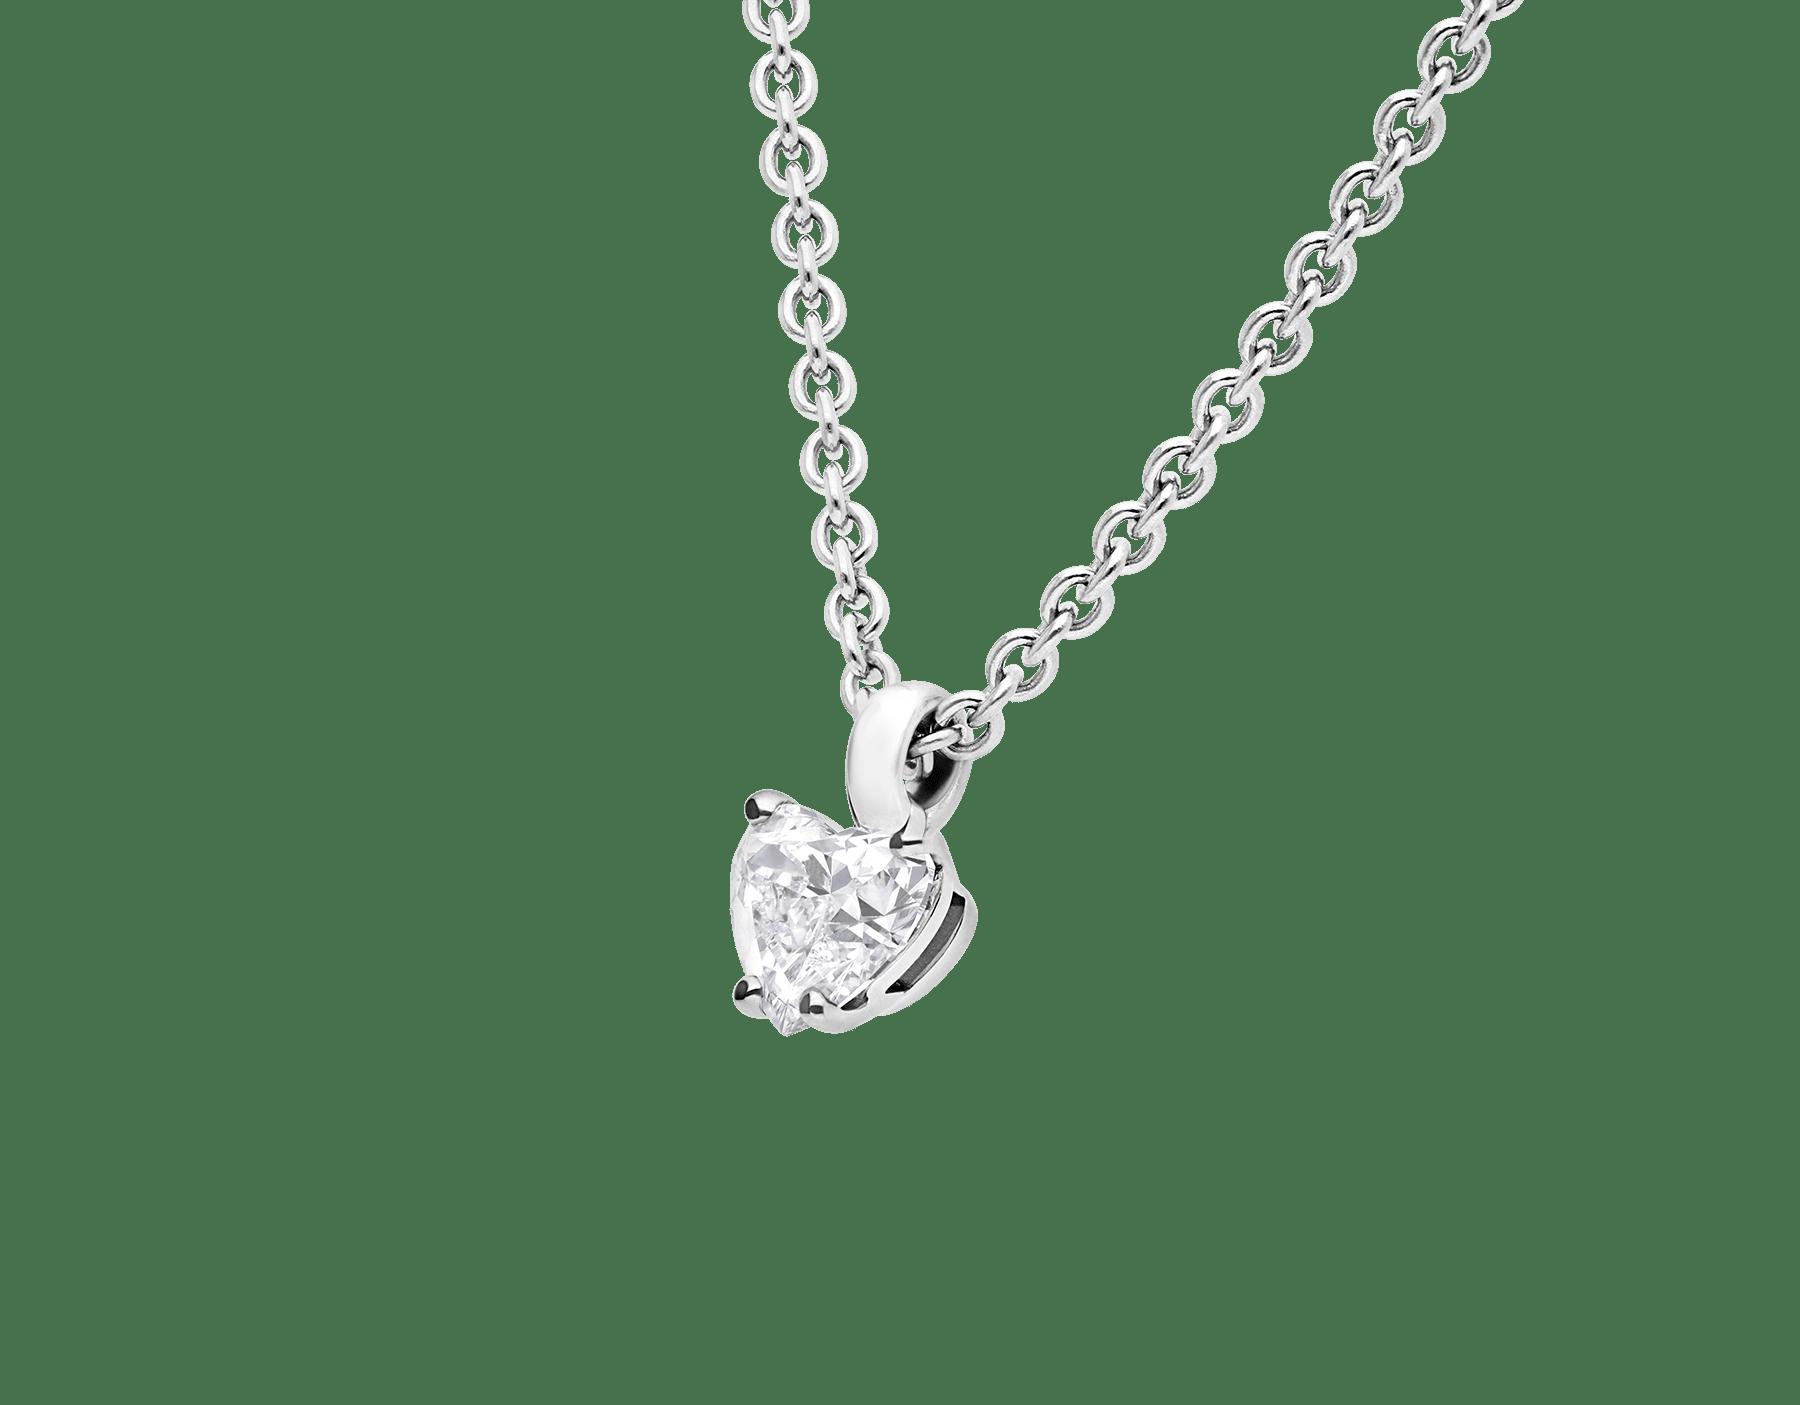 Griffe 18K 白金項墜鑲飾心形切割鑽石,18K 白金鍊帶。 338204 image 3